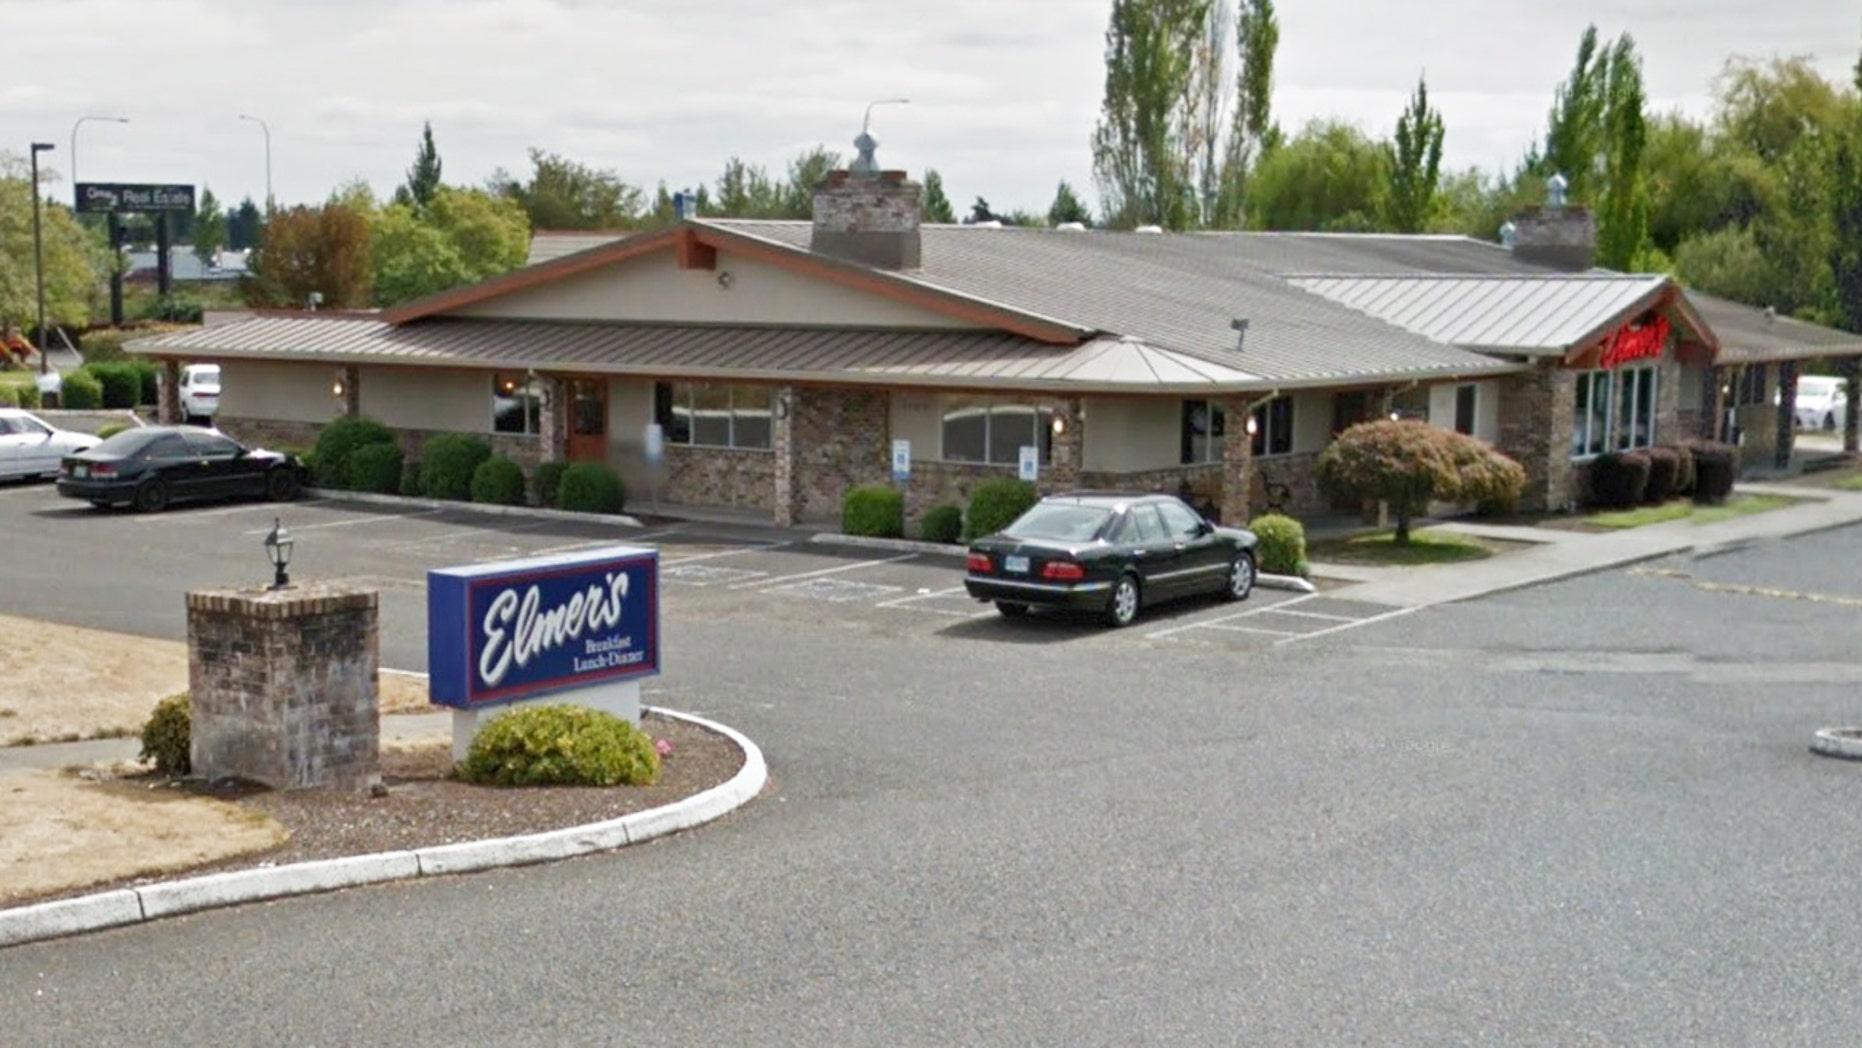 Elmer's restaurants has been accused of engaging in discriminatory consumer practices.